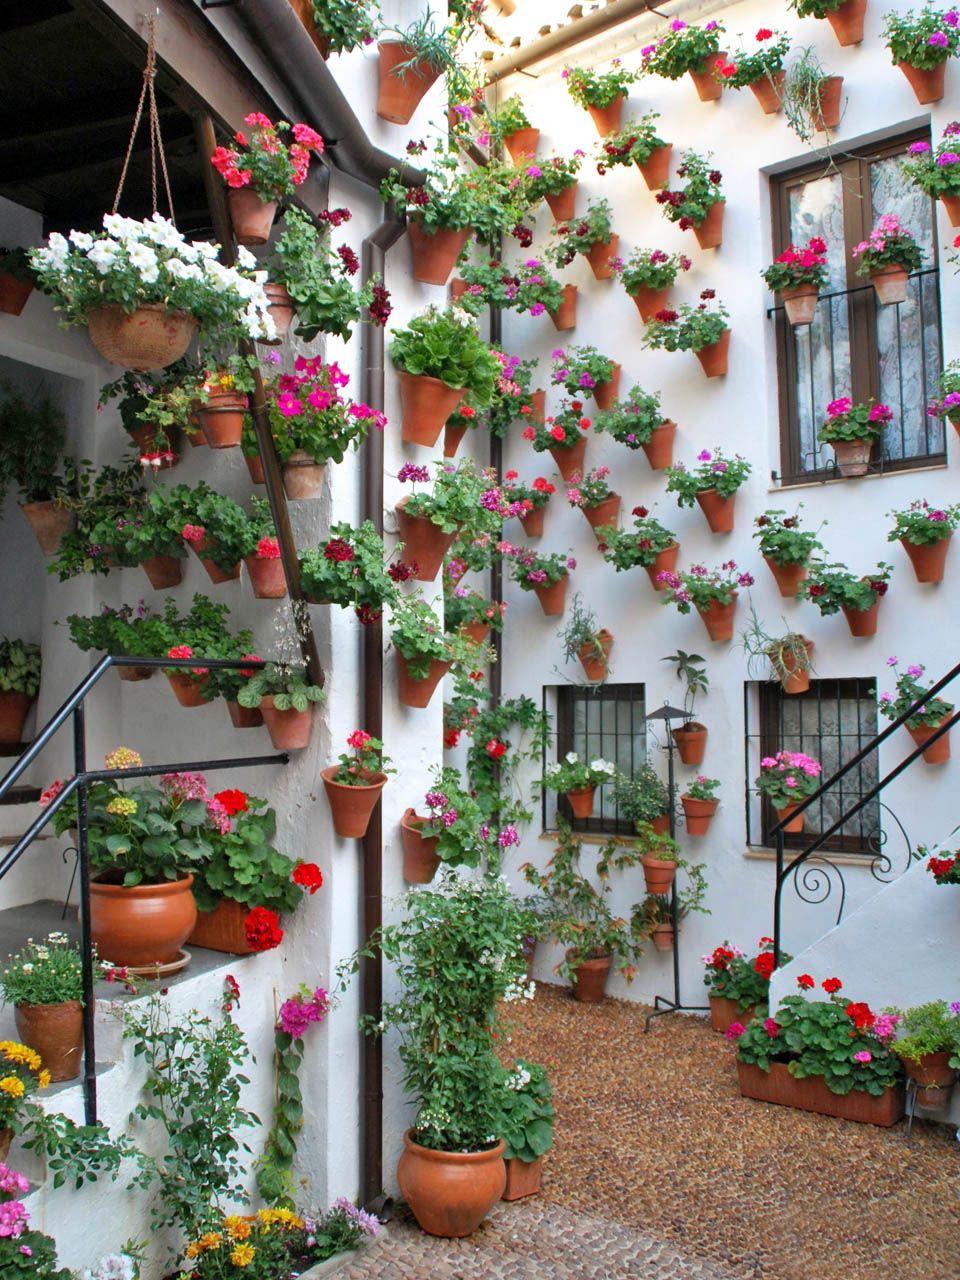 patio martin de roa cordoba 11 с изображениями картинки on sweet dreams for your home plants decoration precautions and options id=94655